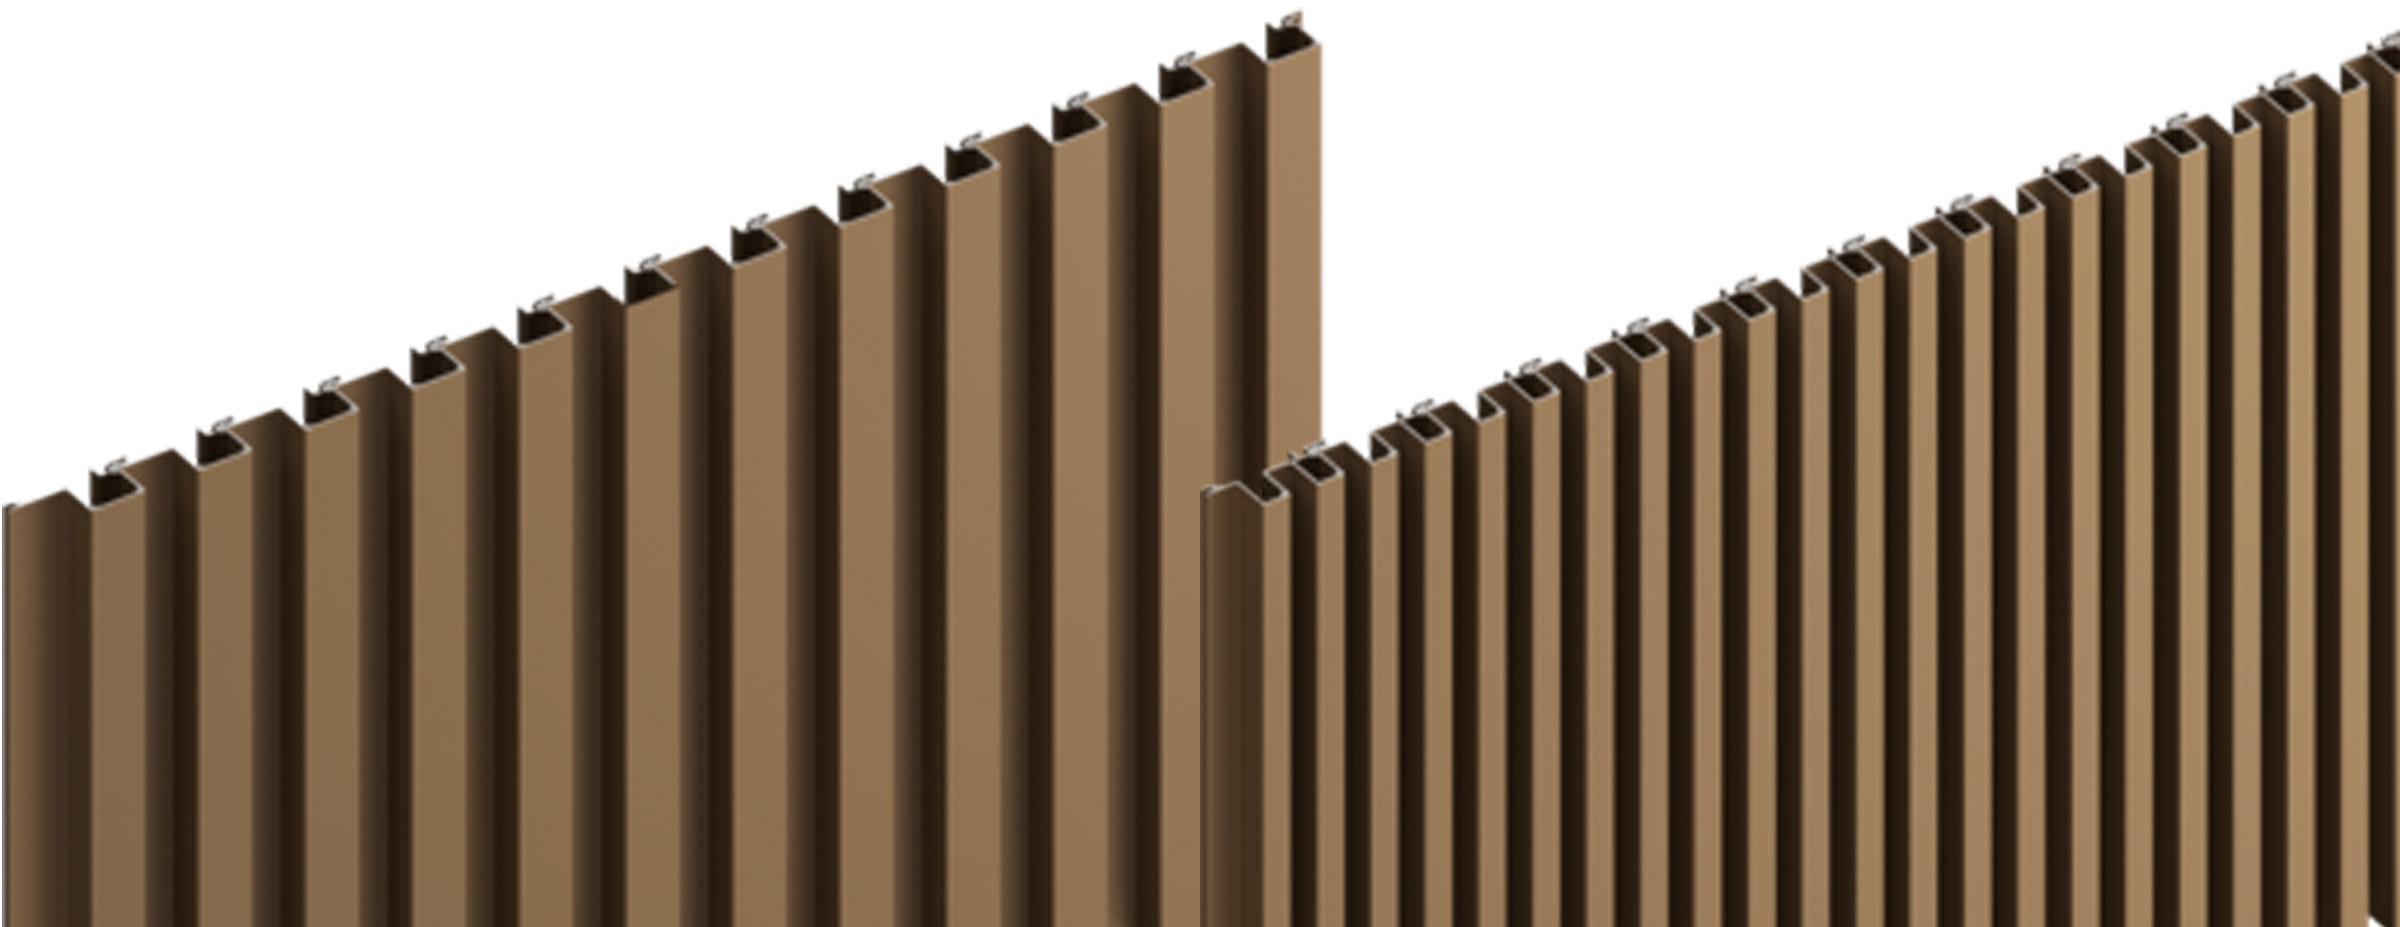 Sculptform Aluminium Click-on Cladding block profile